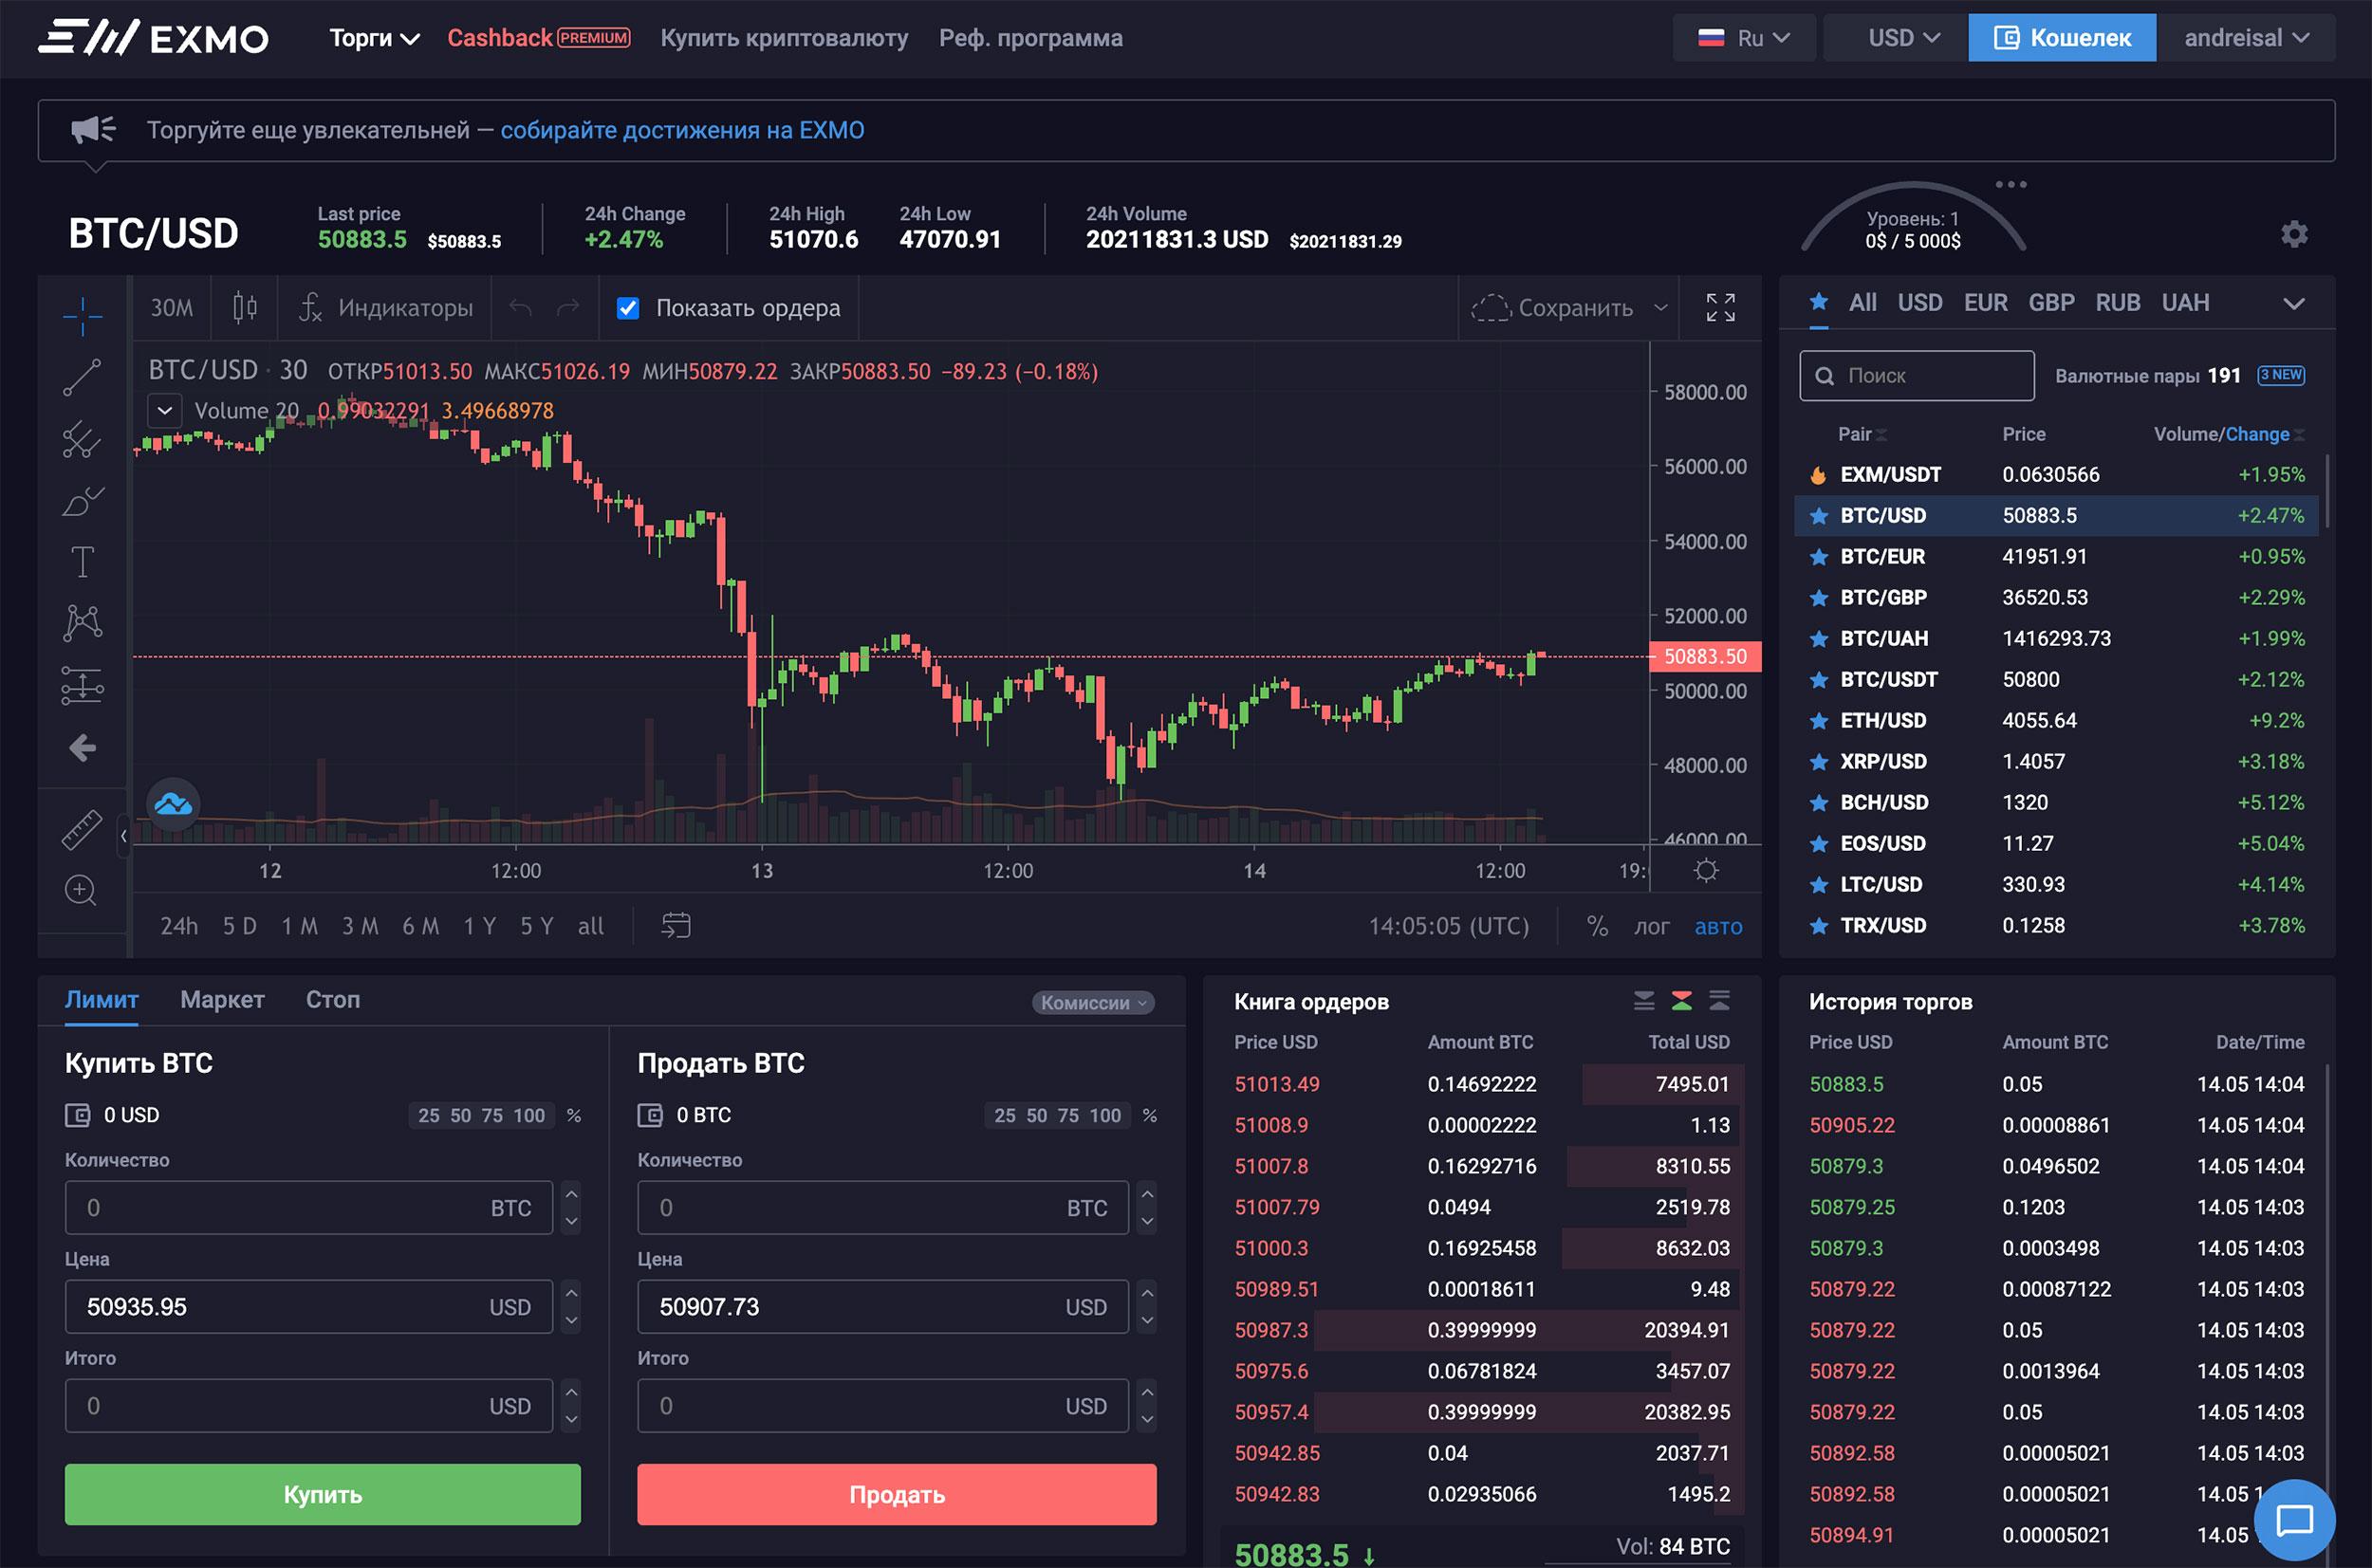 биржа криптовалют exmo платформа интерфейс